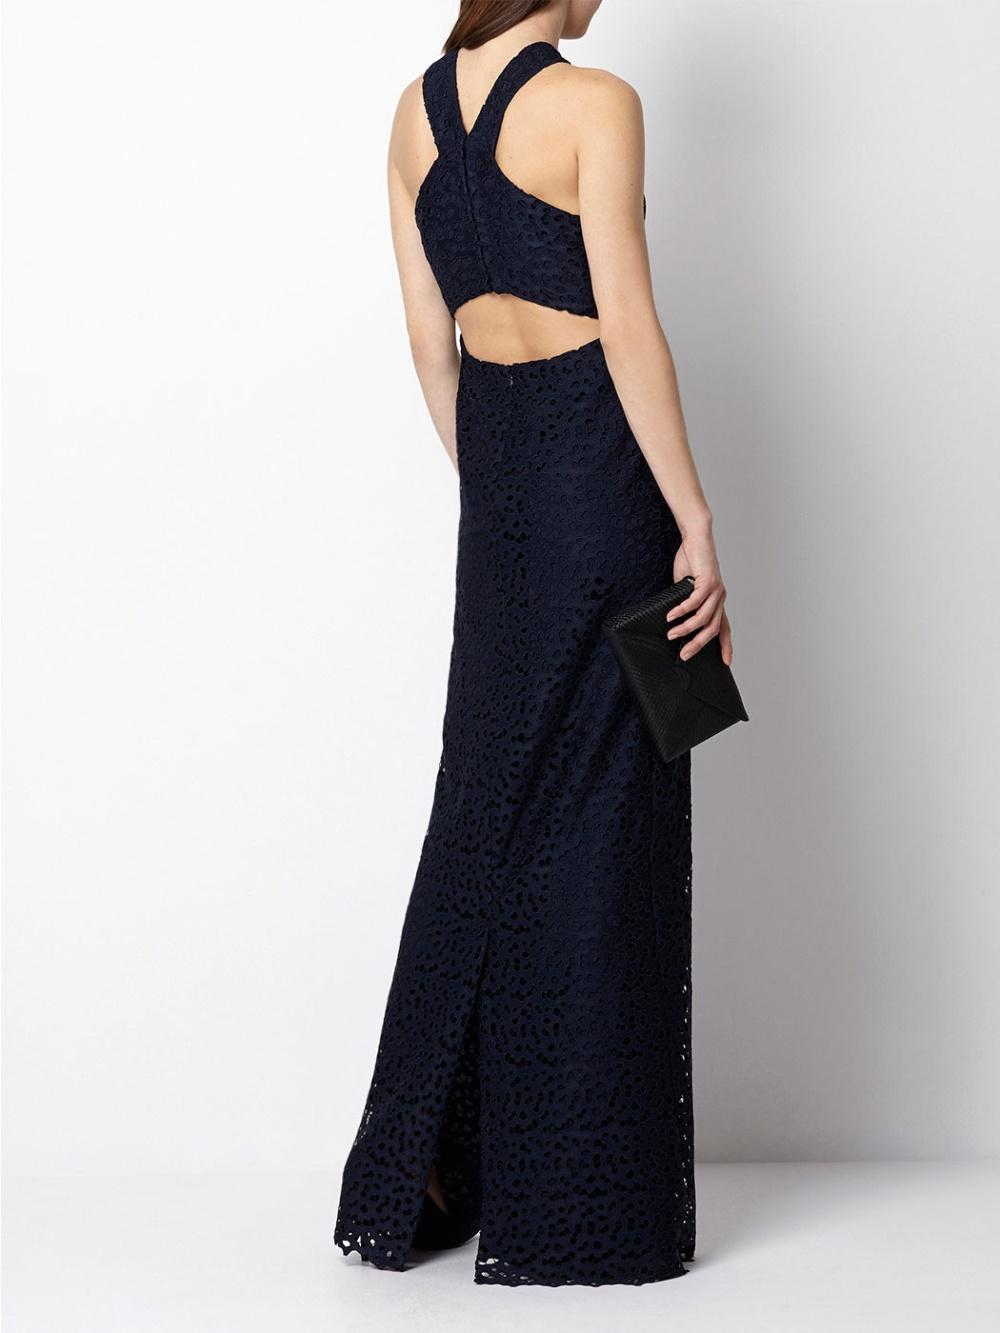 invitada-maxi-vestido-calado-hoss-intropia